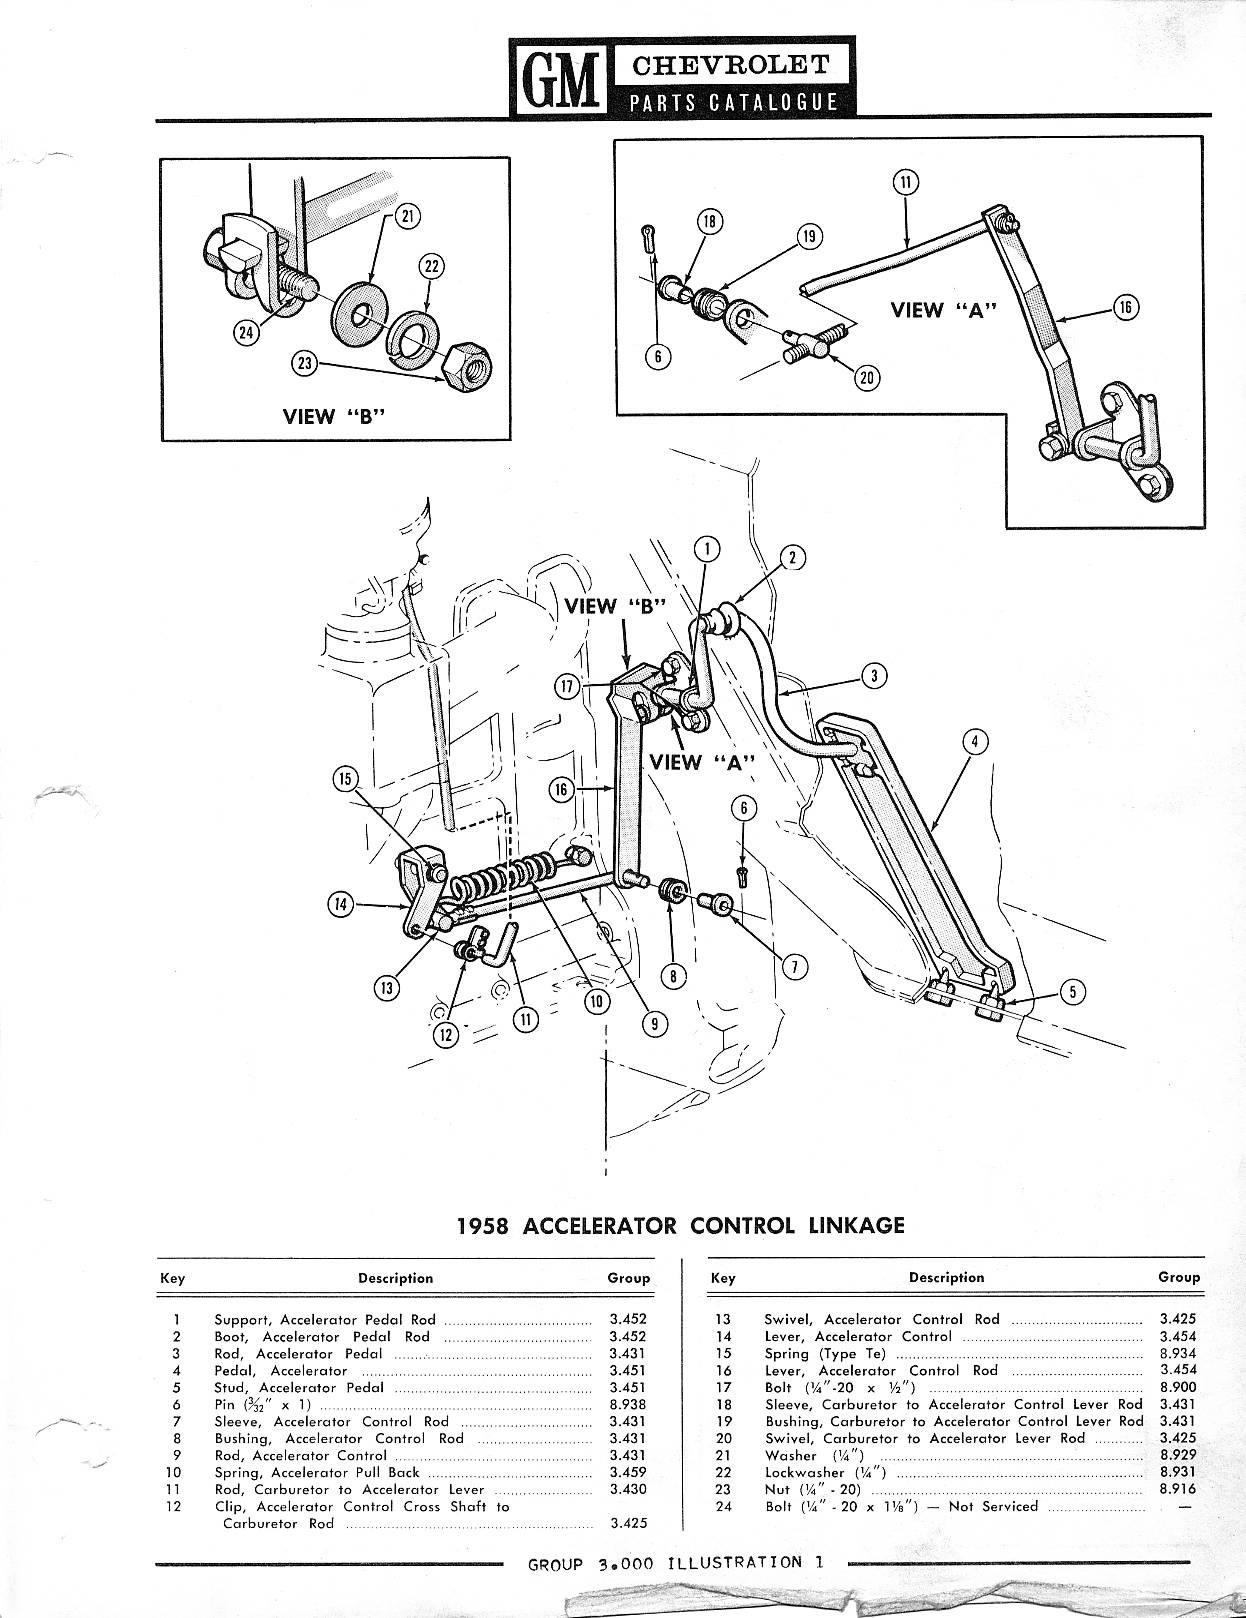 1958-1968 Chevrolet Parts Catalog / Image1.jpg